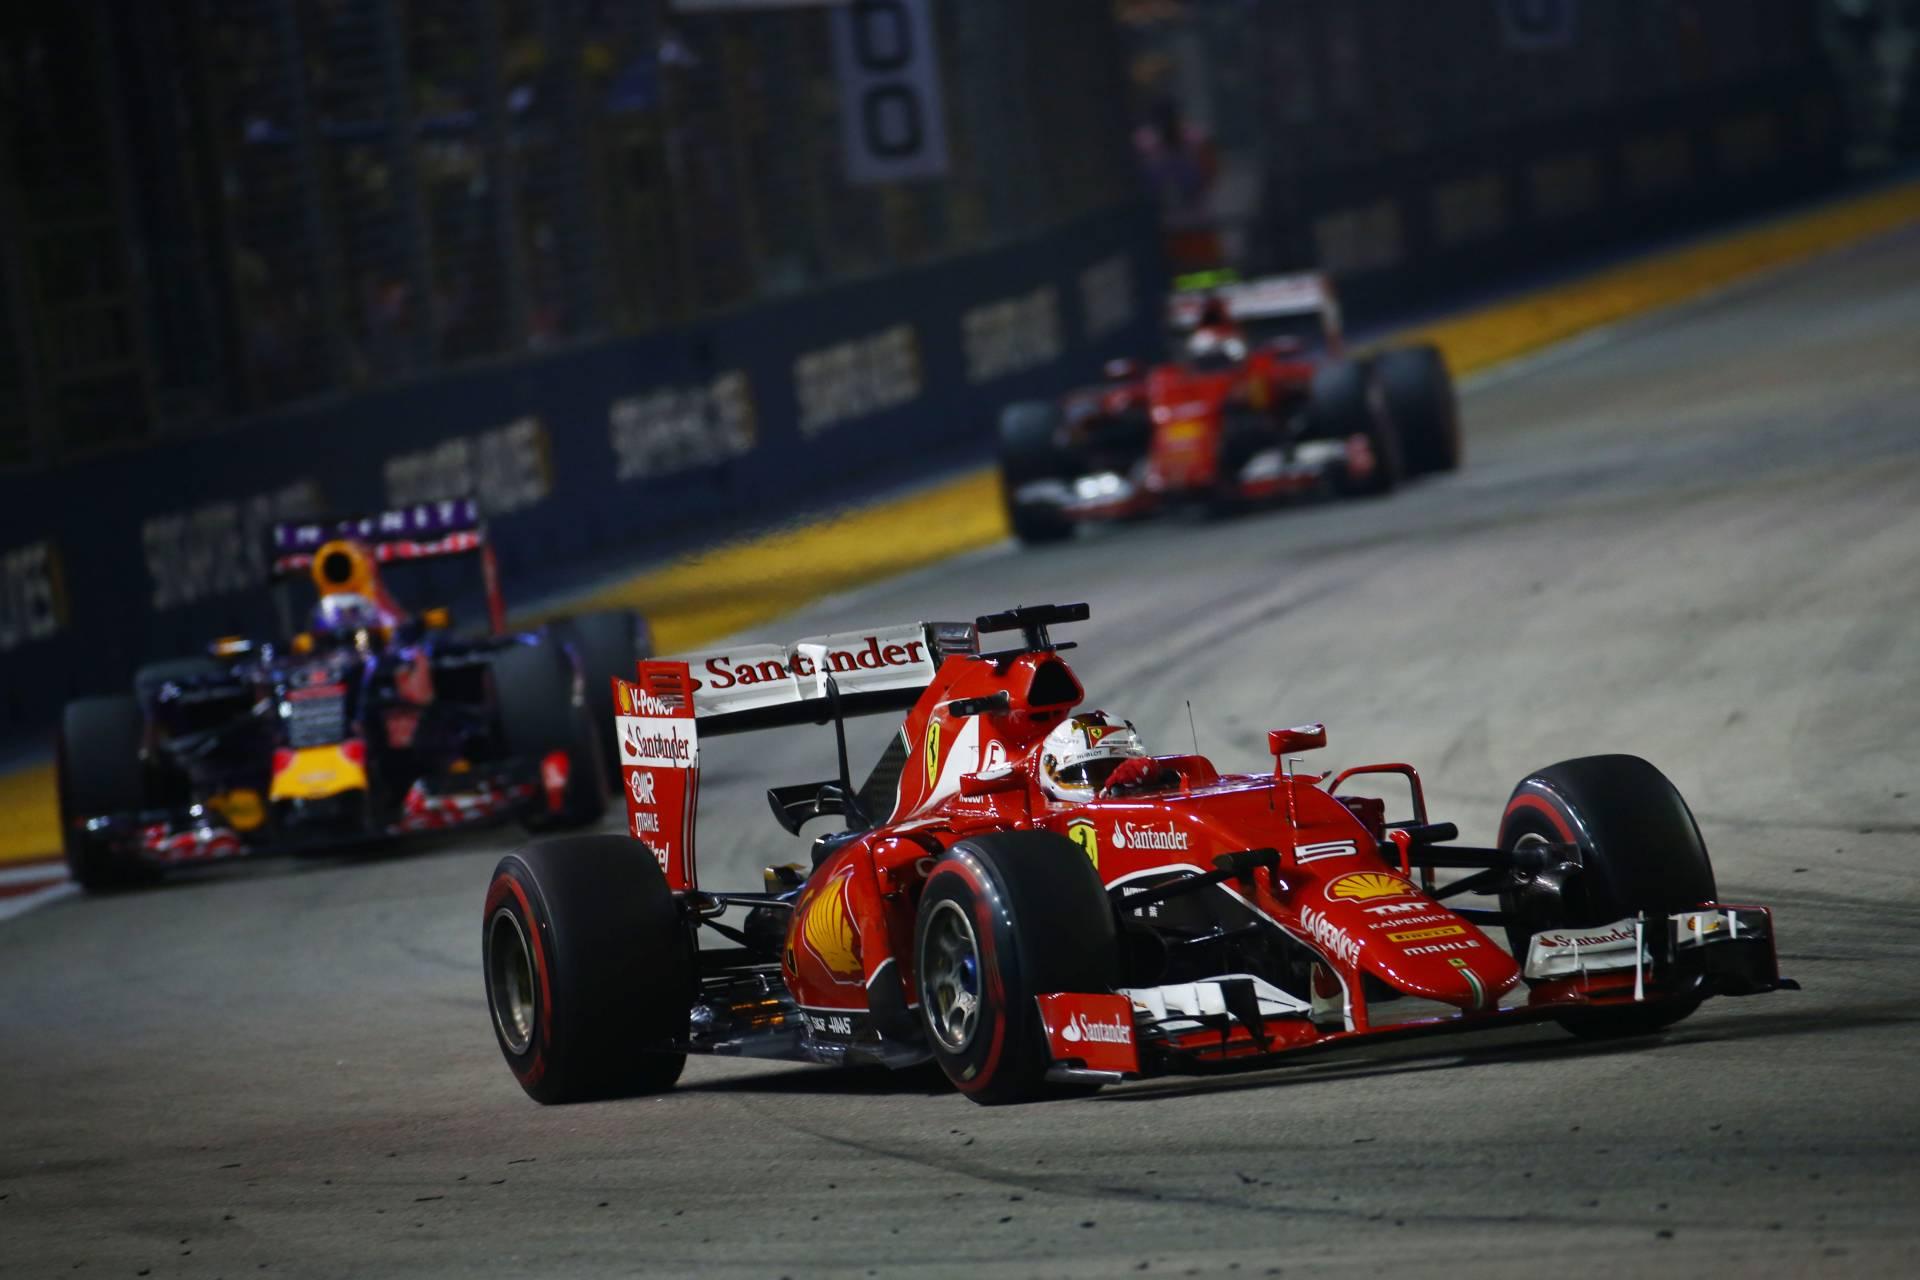 Wallpapers Singapore Grand Prix Of 2015 Marcos Formula